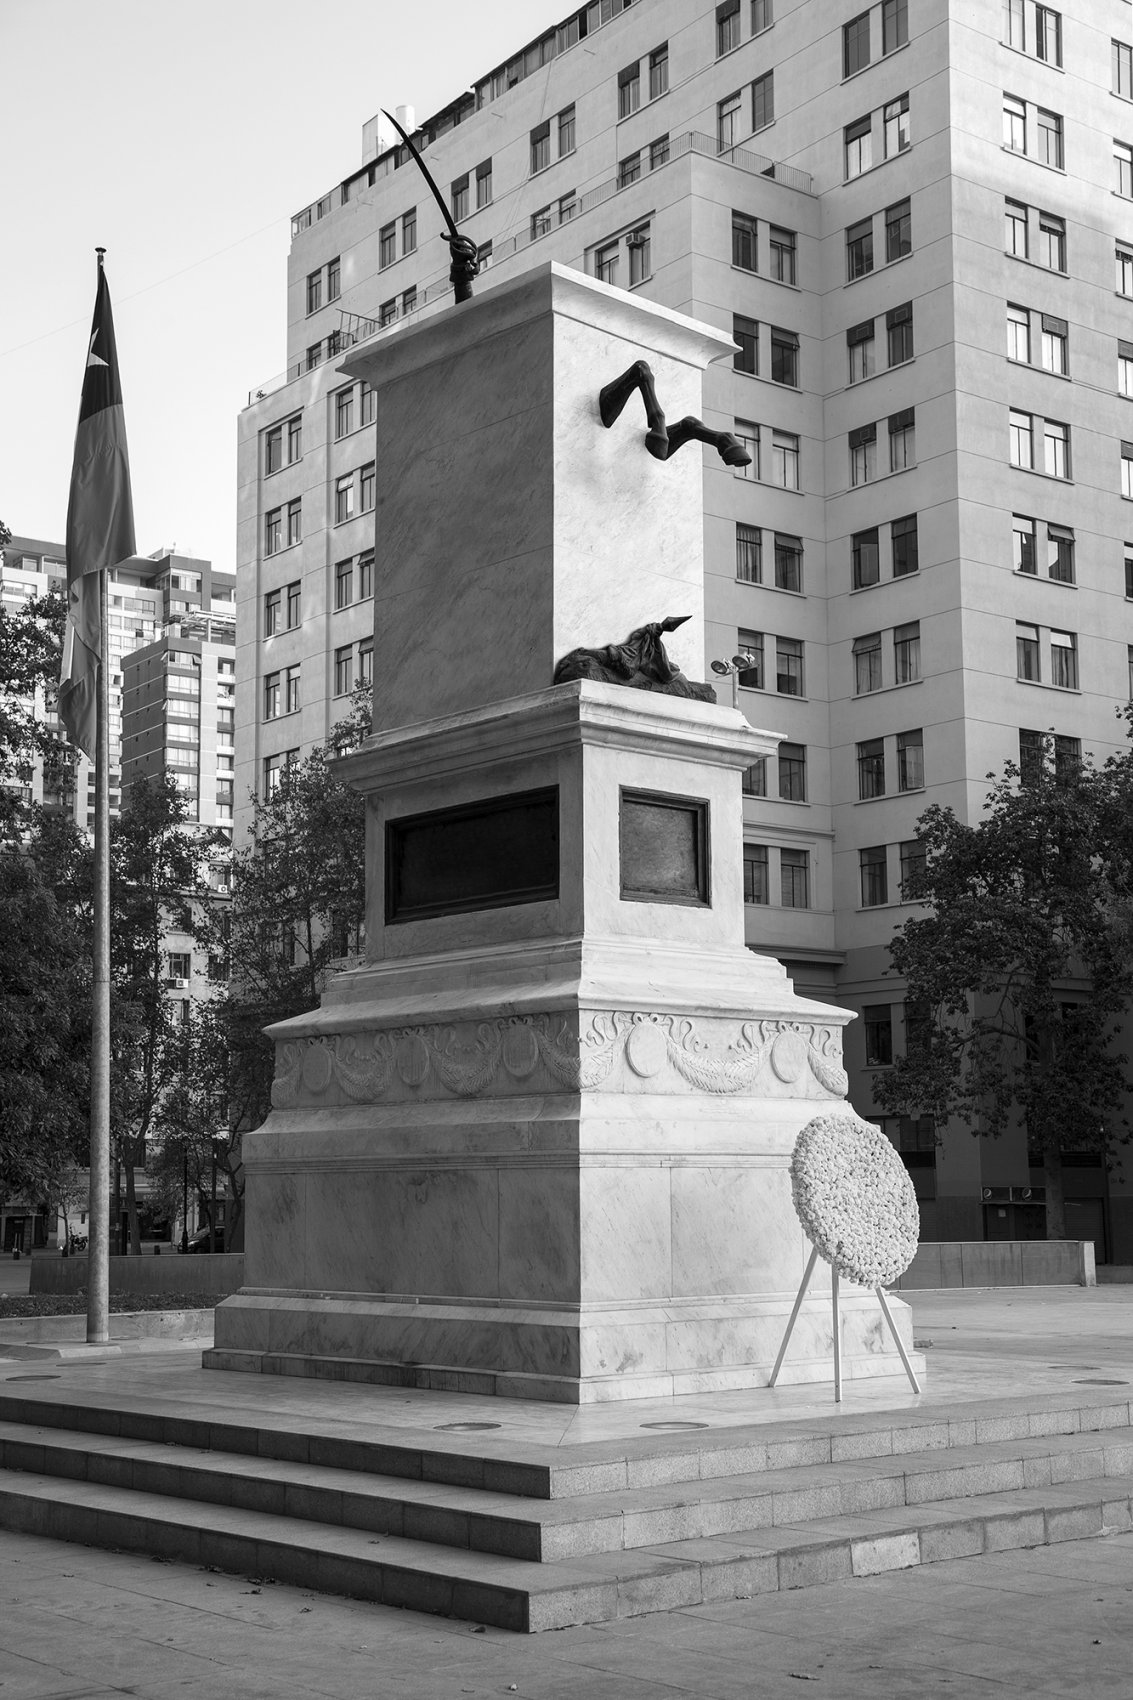 Ecuestre n°1. Serie Monumento Editado, Chile-Perú-Bolivia-Argentina (2014) - Andrés Durán Dávila